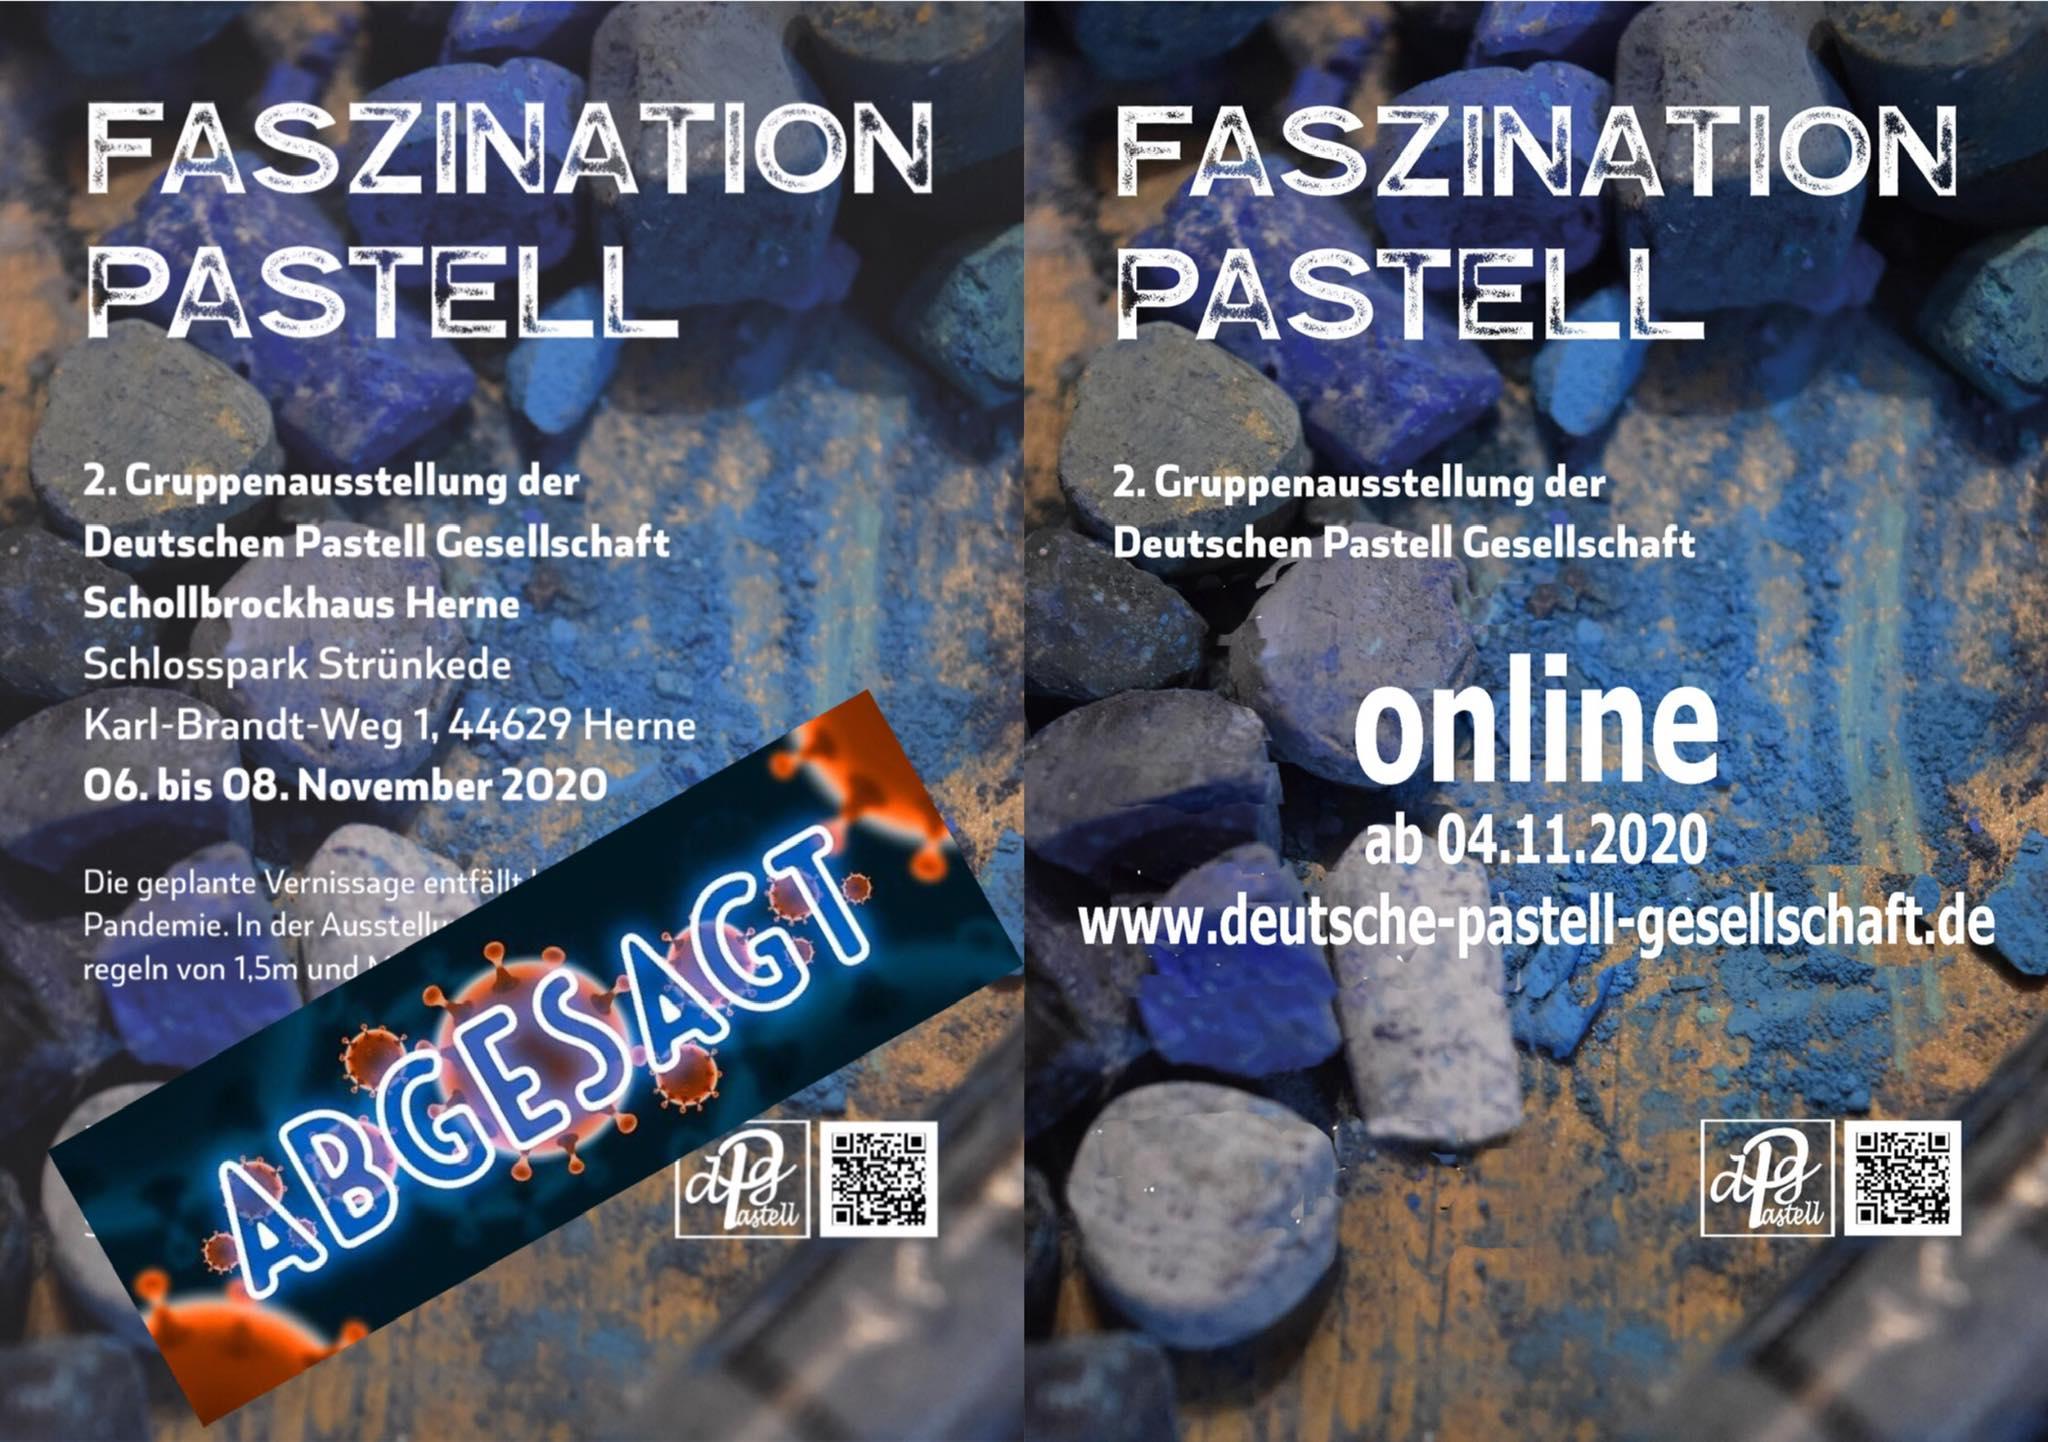 Faszination Pastell – 06. November bis 08 November